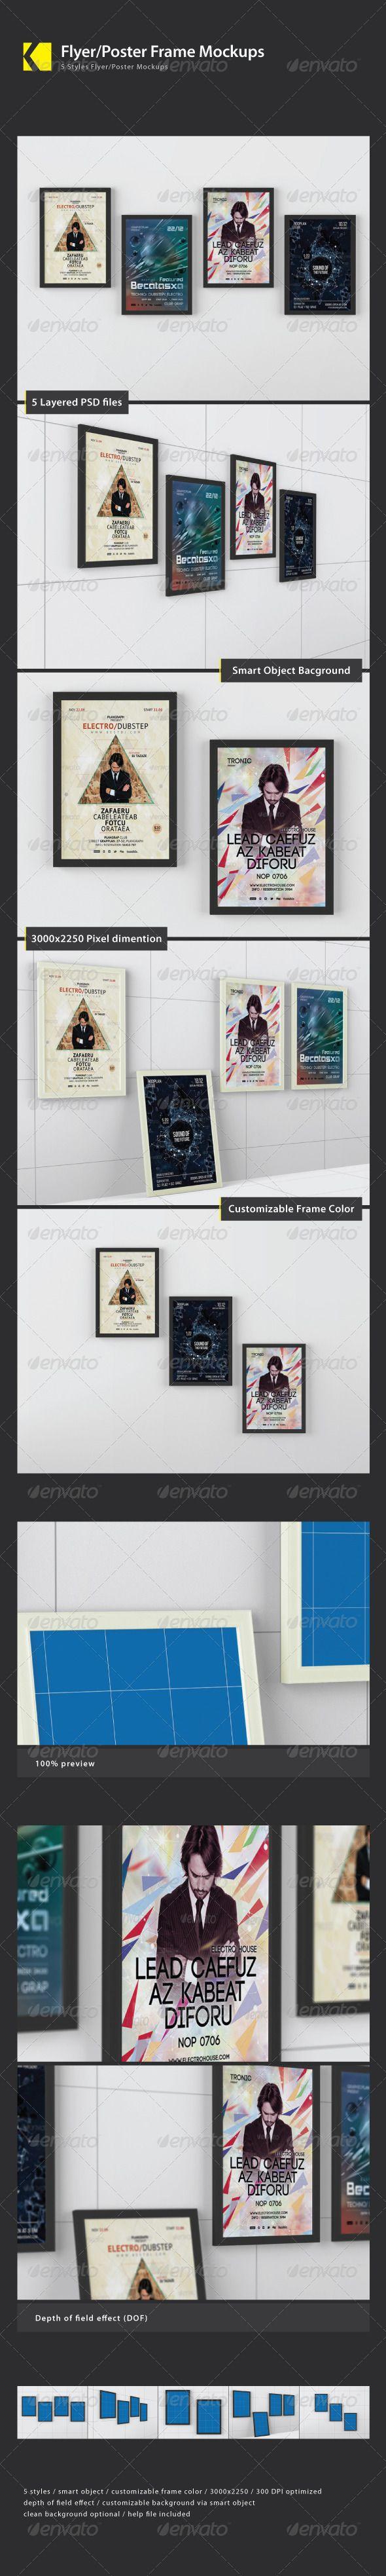 Flyer/Poster Frame Mockups — Photoshop PSD #background #mock-ups • Available here → https://graphicriver.net/item/flyerposter-frame-mockups/4721864?ref=pxcr